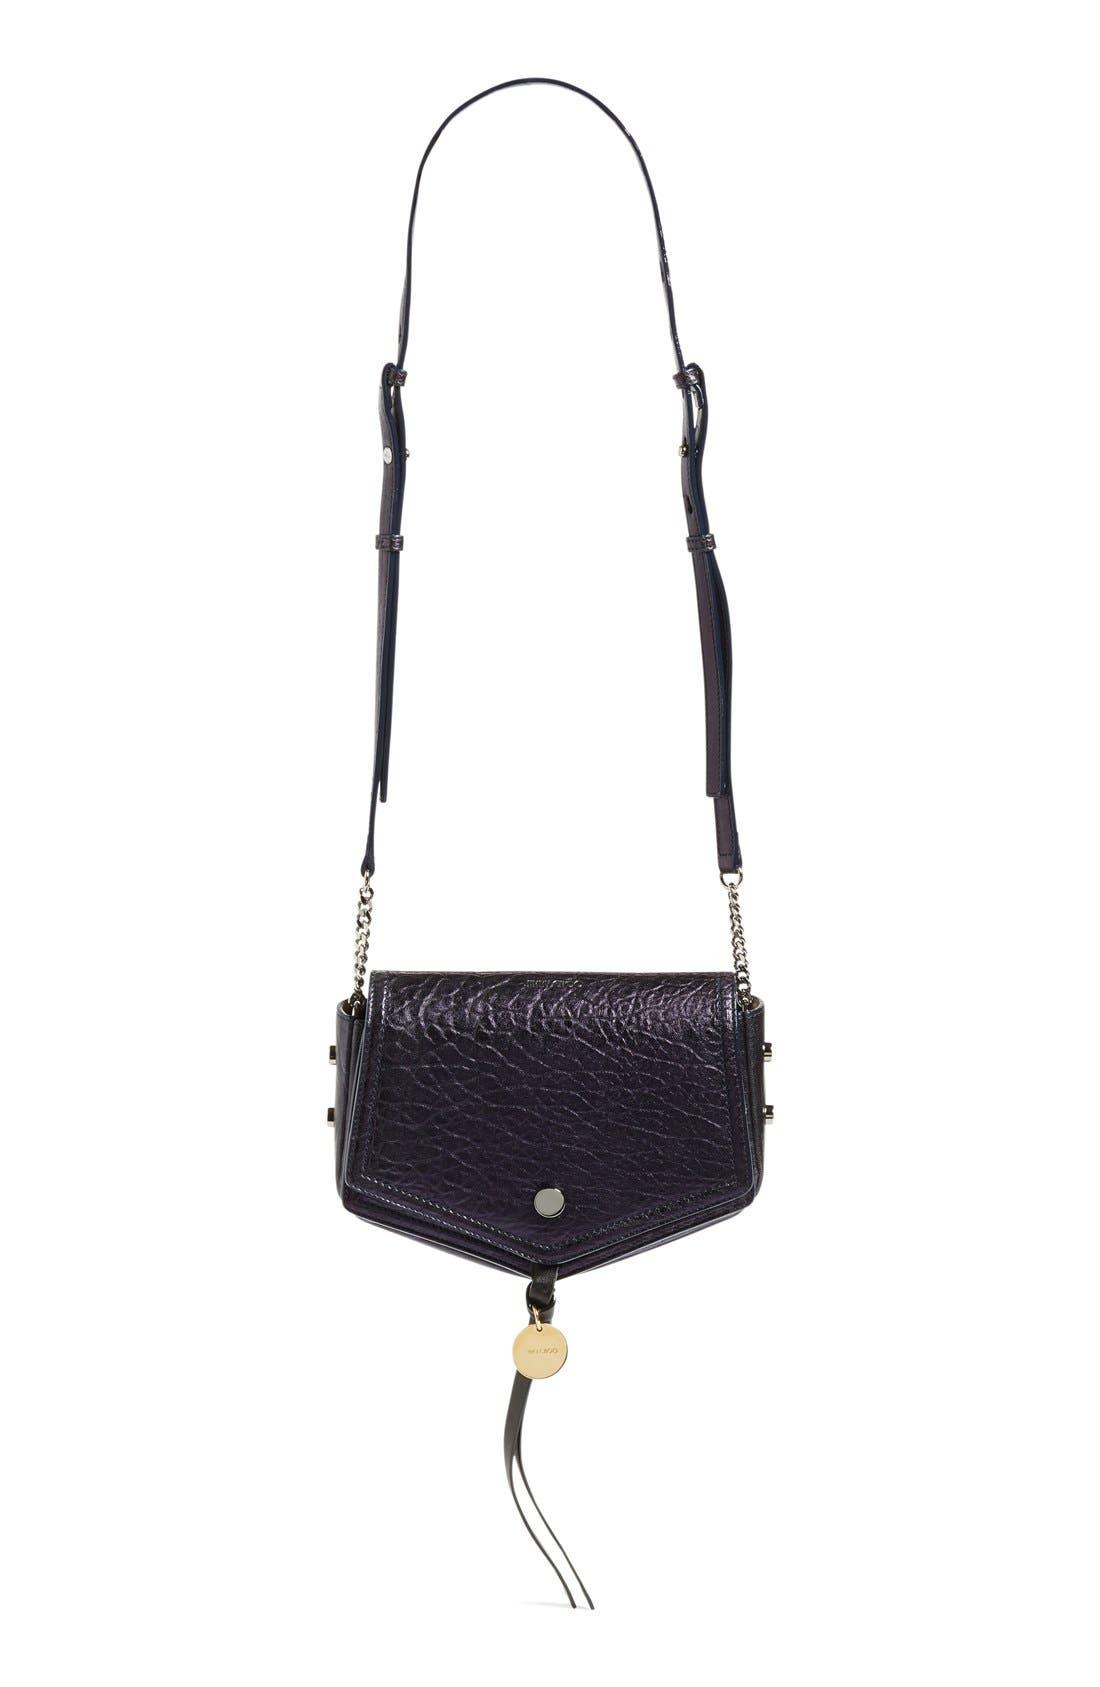 Main Image - Jimmy Choo Arrow Metallic Grained Leather Shoulder Bag